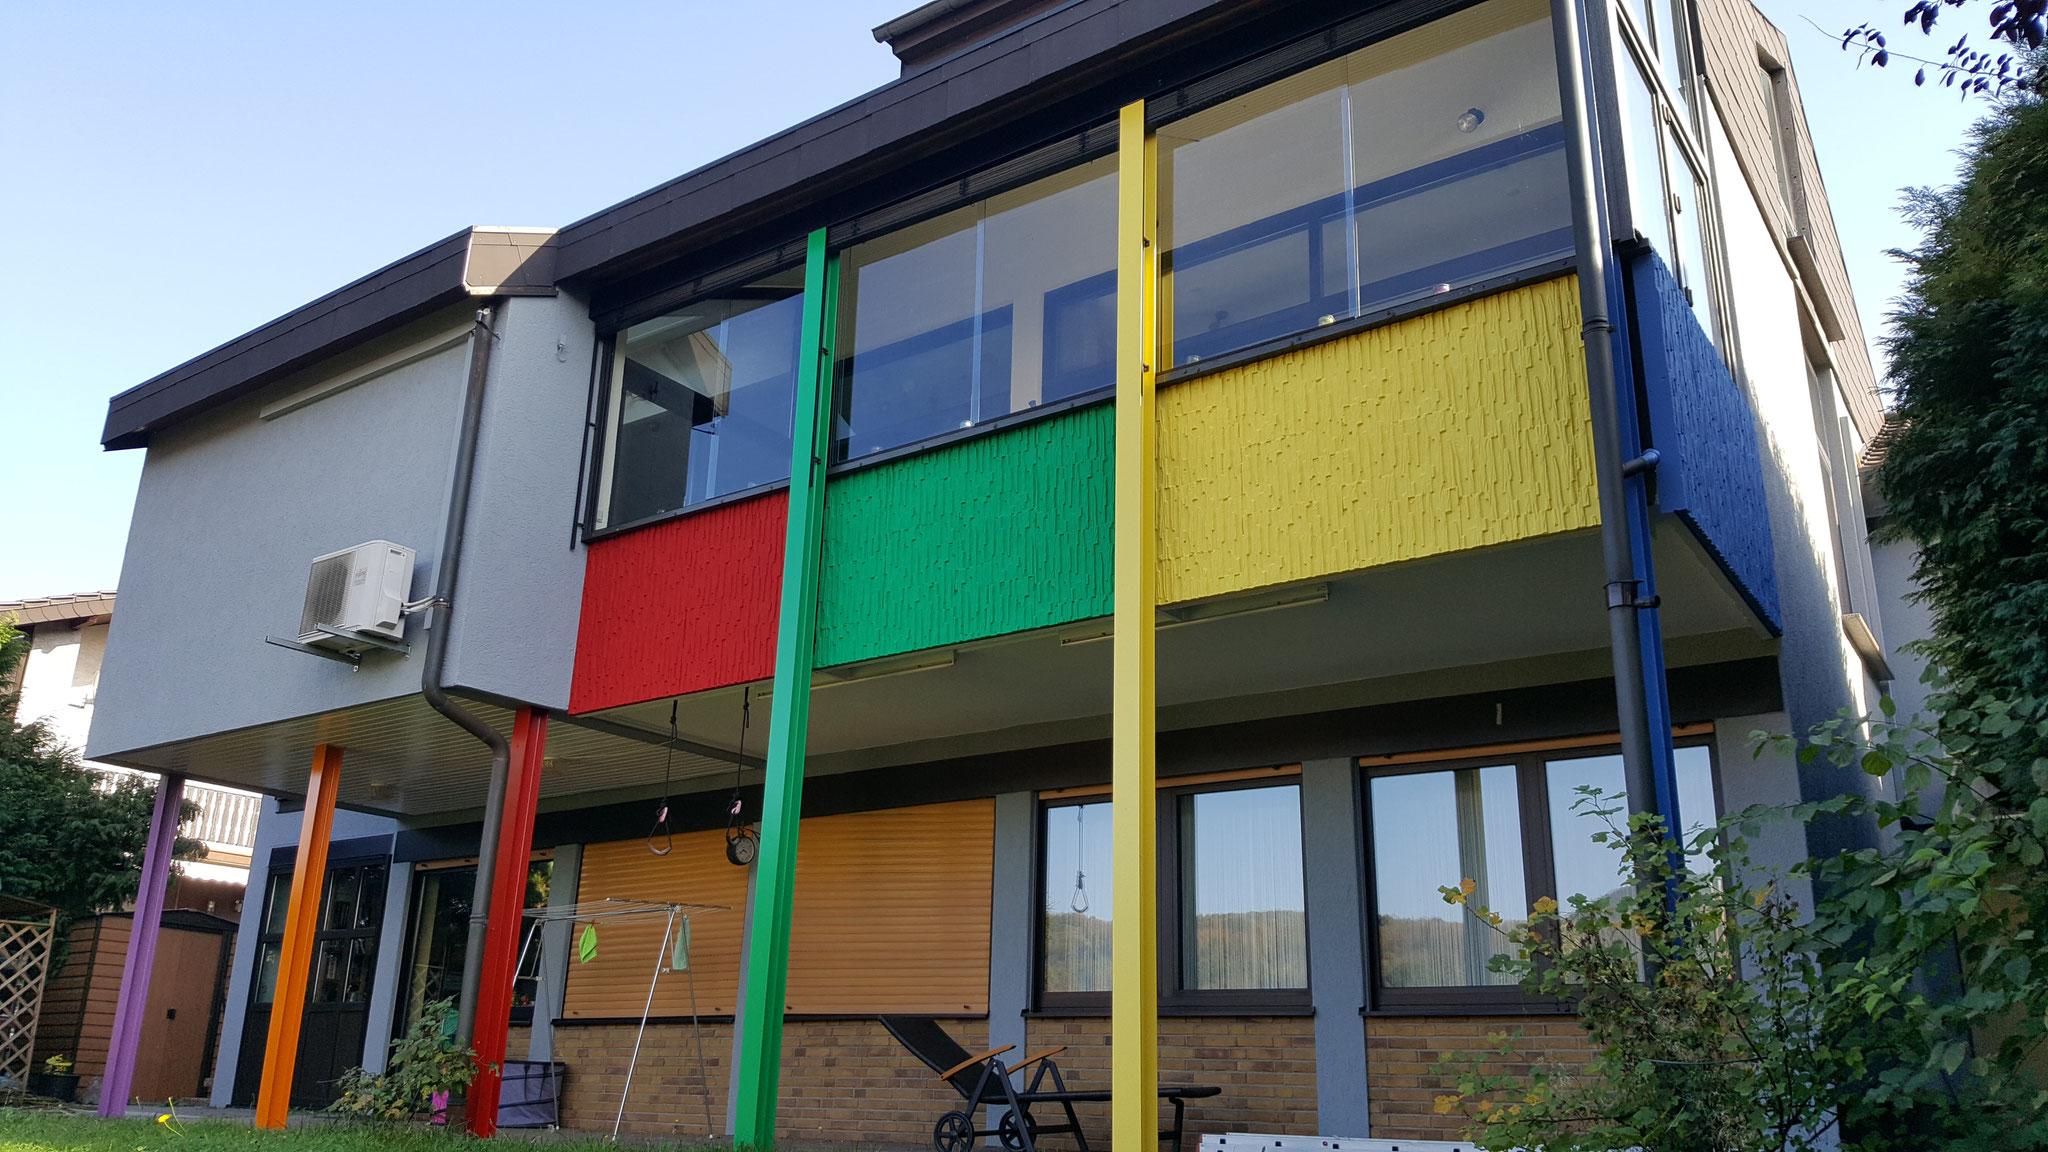 Kreativ gestaltete Fassadenfläche